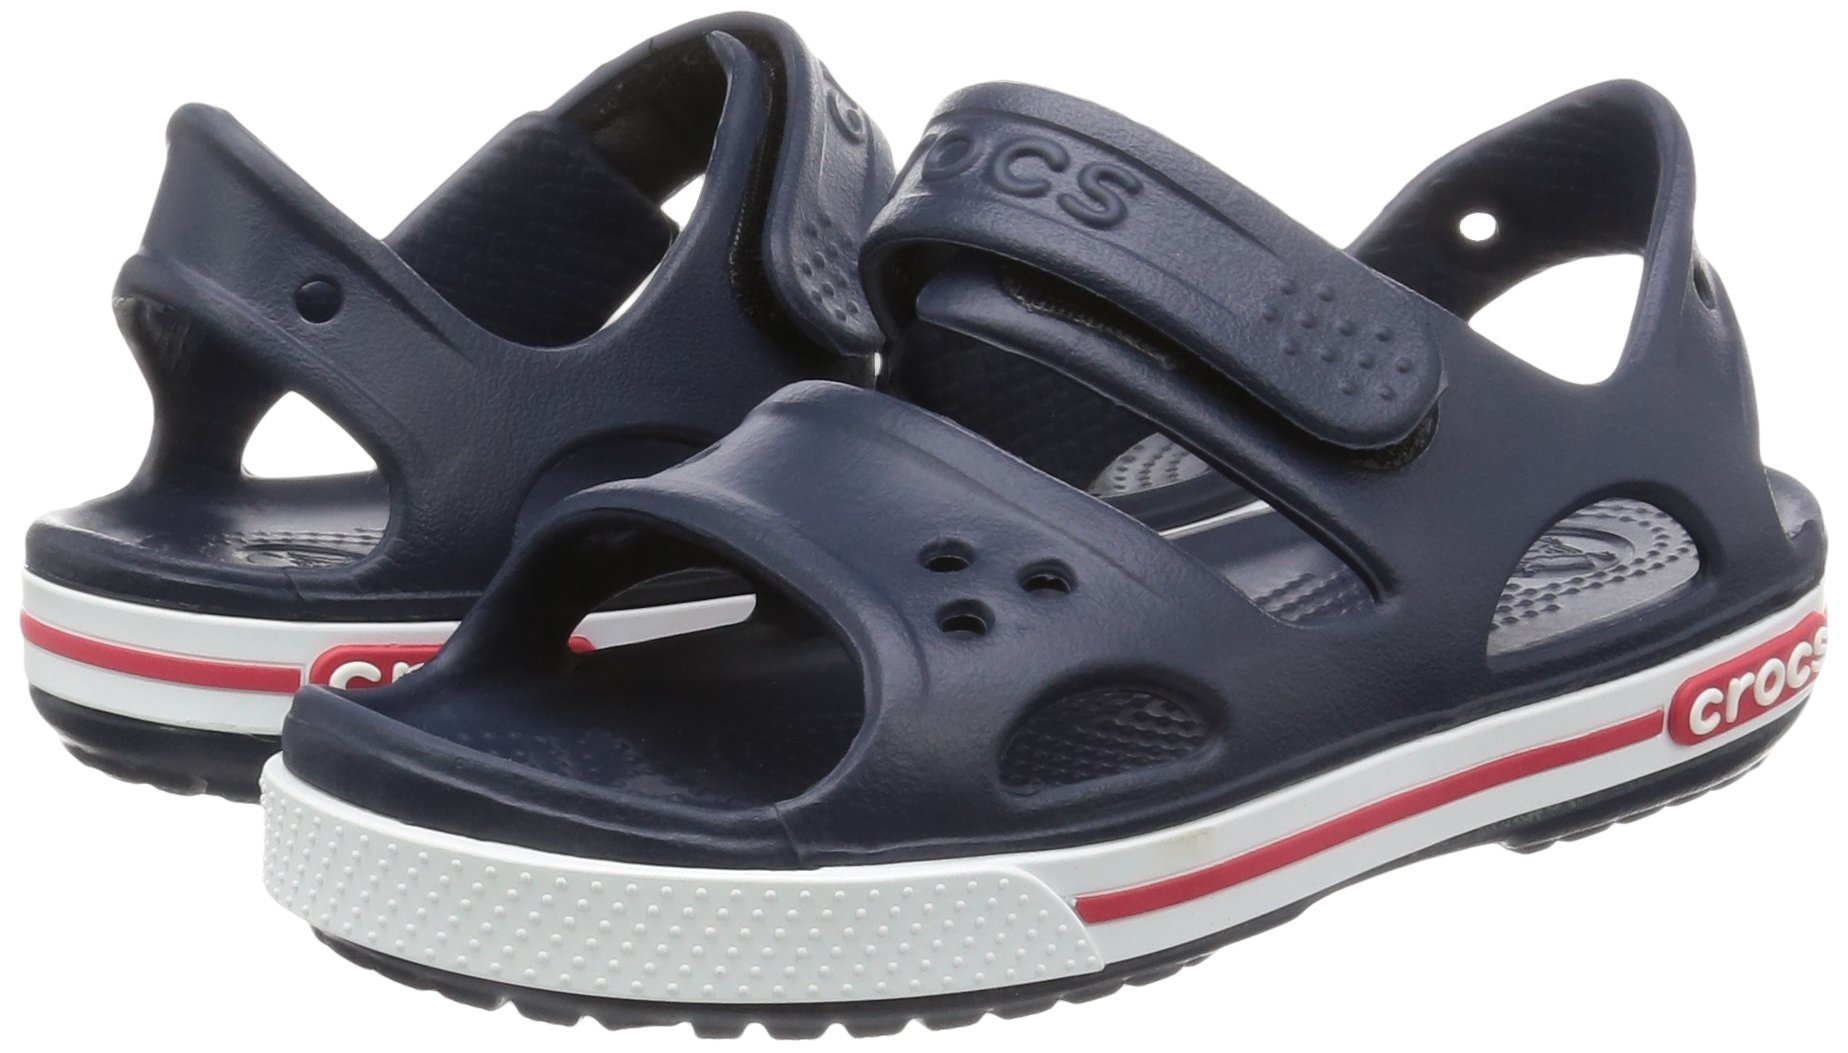 Crocs Kid's Boys and Girls Crocband II Sandal | Pre School, Navy/White, 5 M US Toddler by Crocs (Image #6)